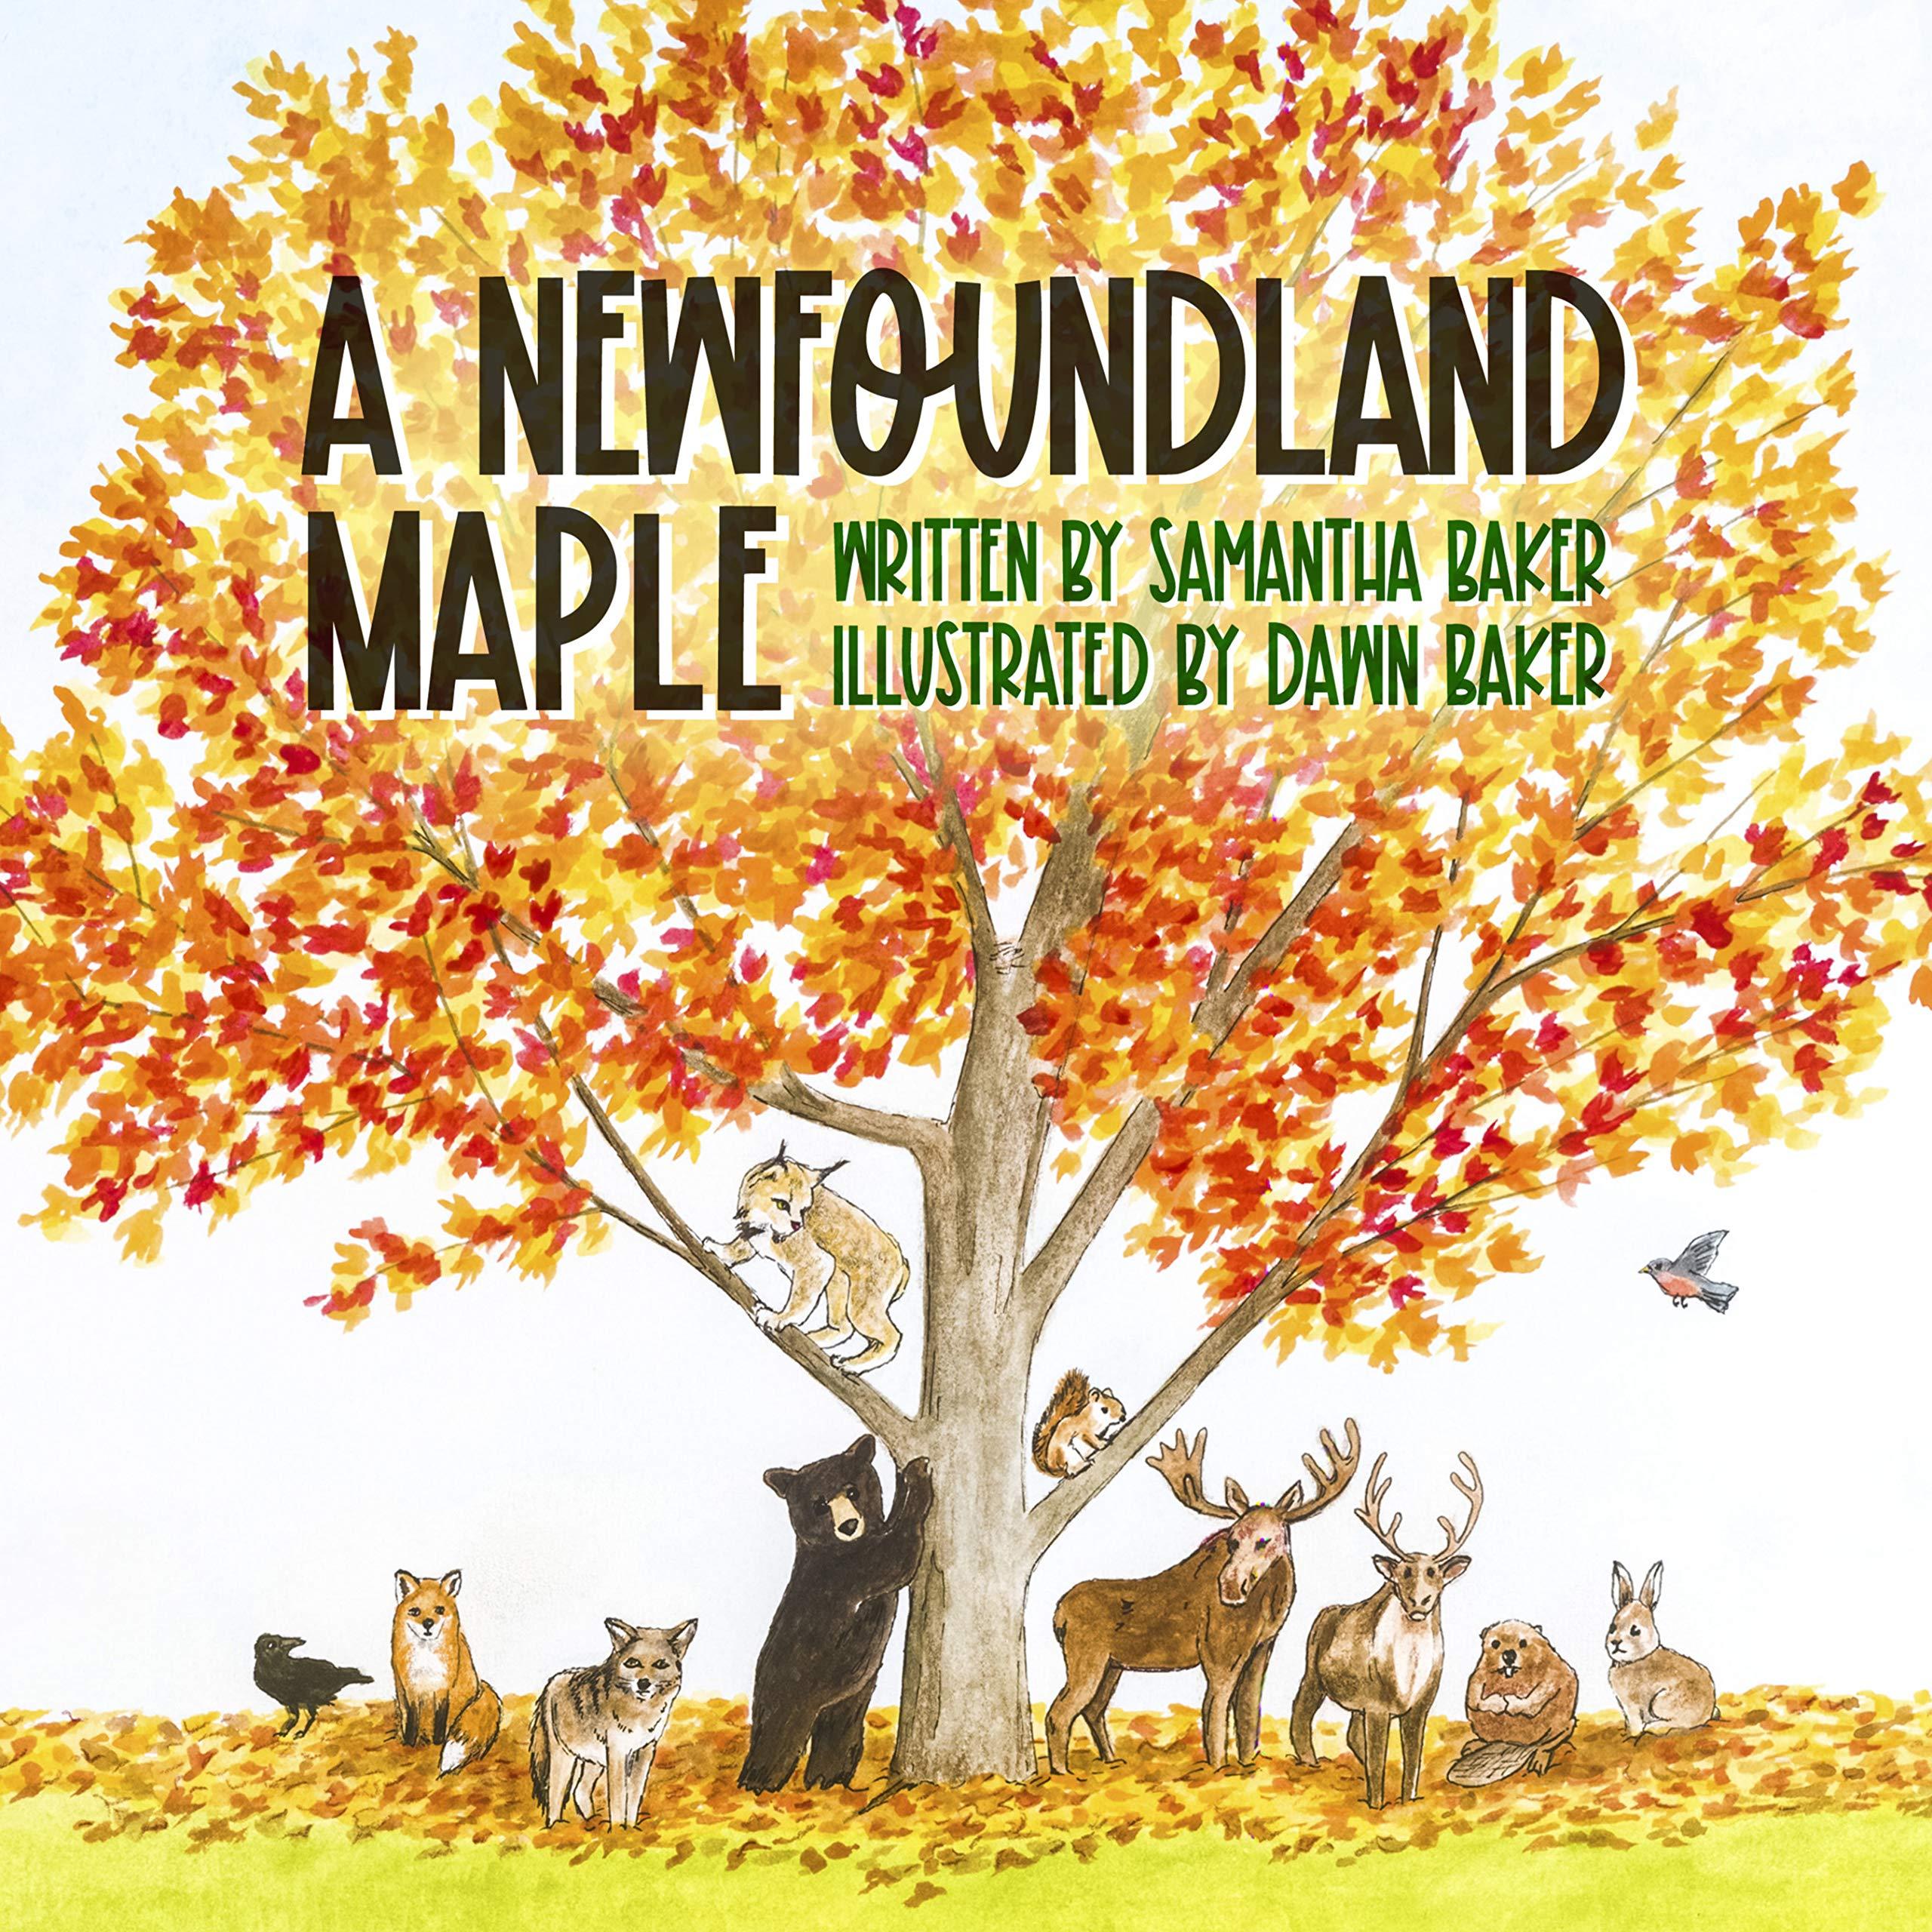 A Newfoundland Maple